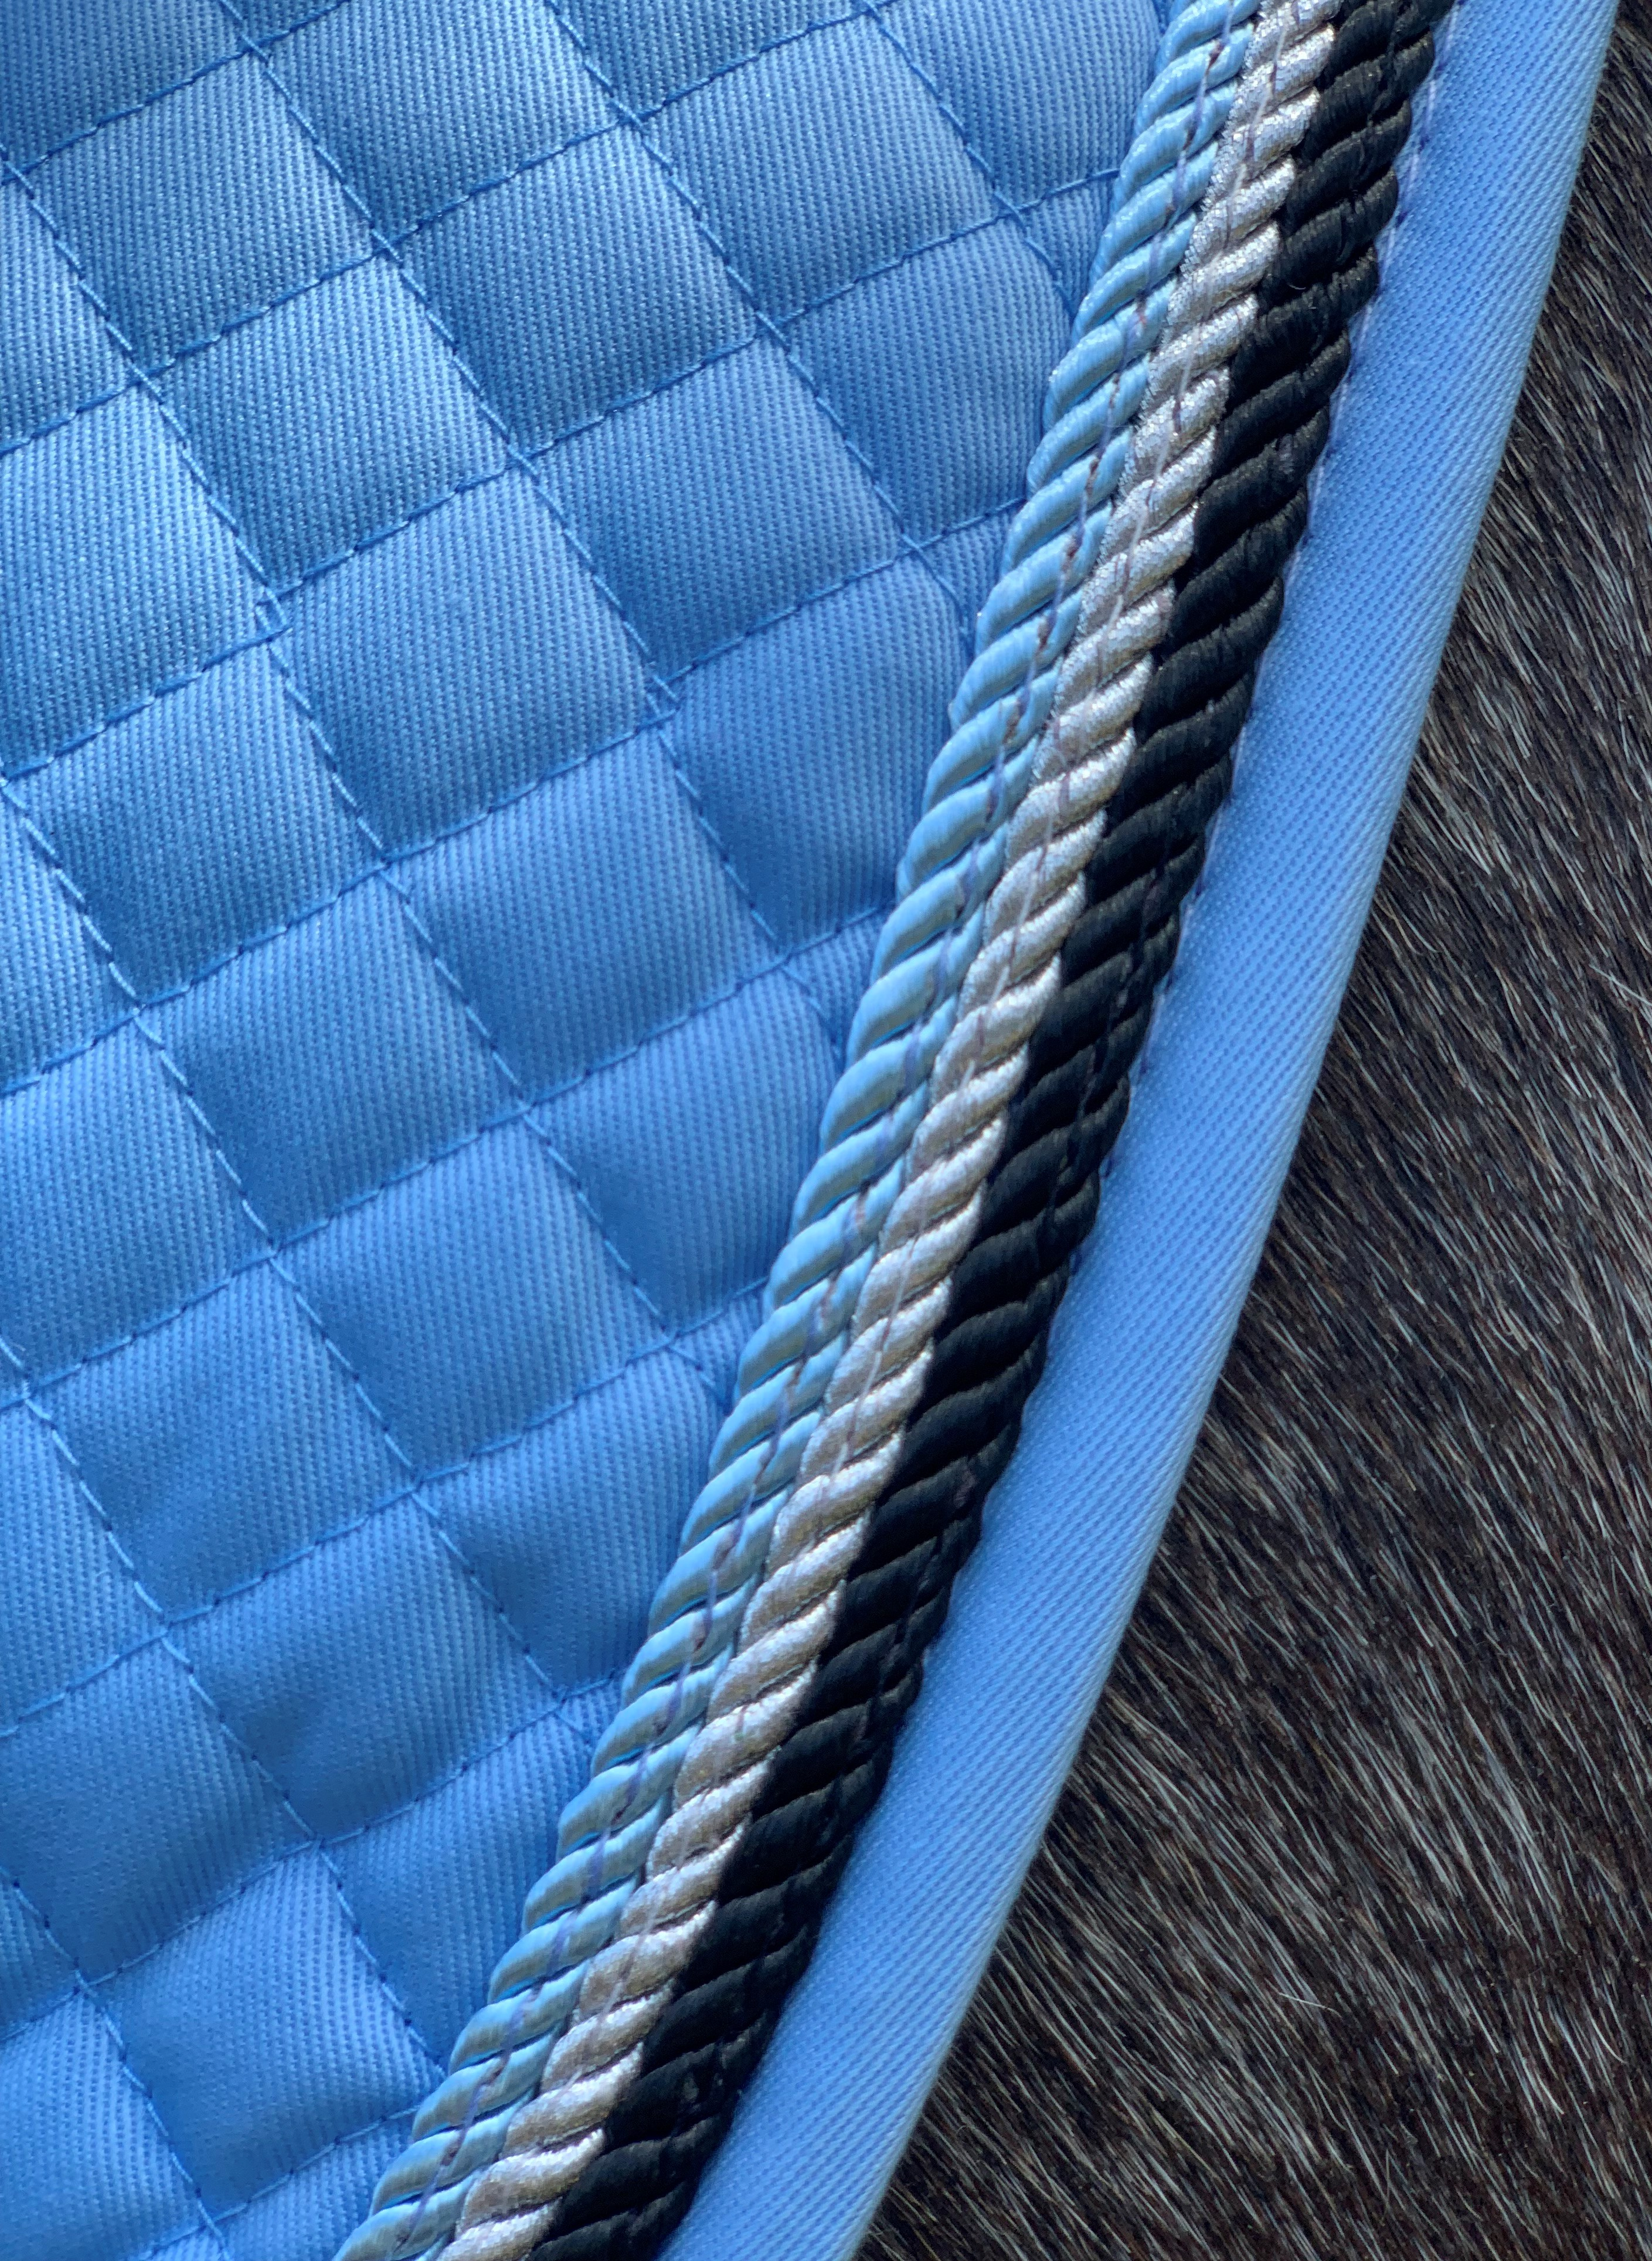 Valleyhorsewear Dressage Saddle Pad-Light Blue